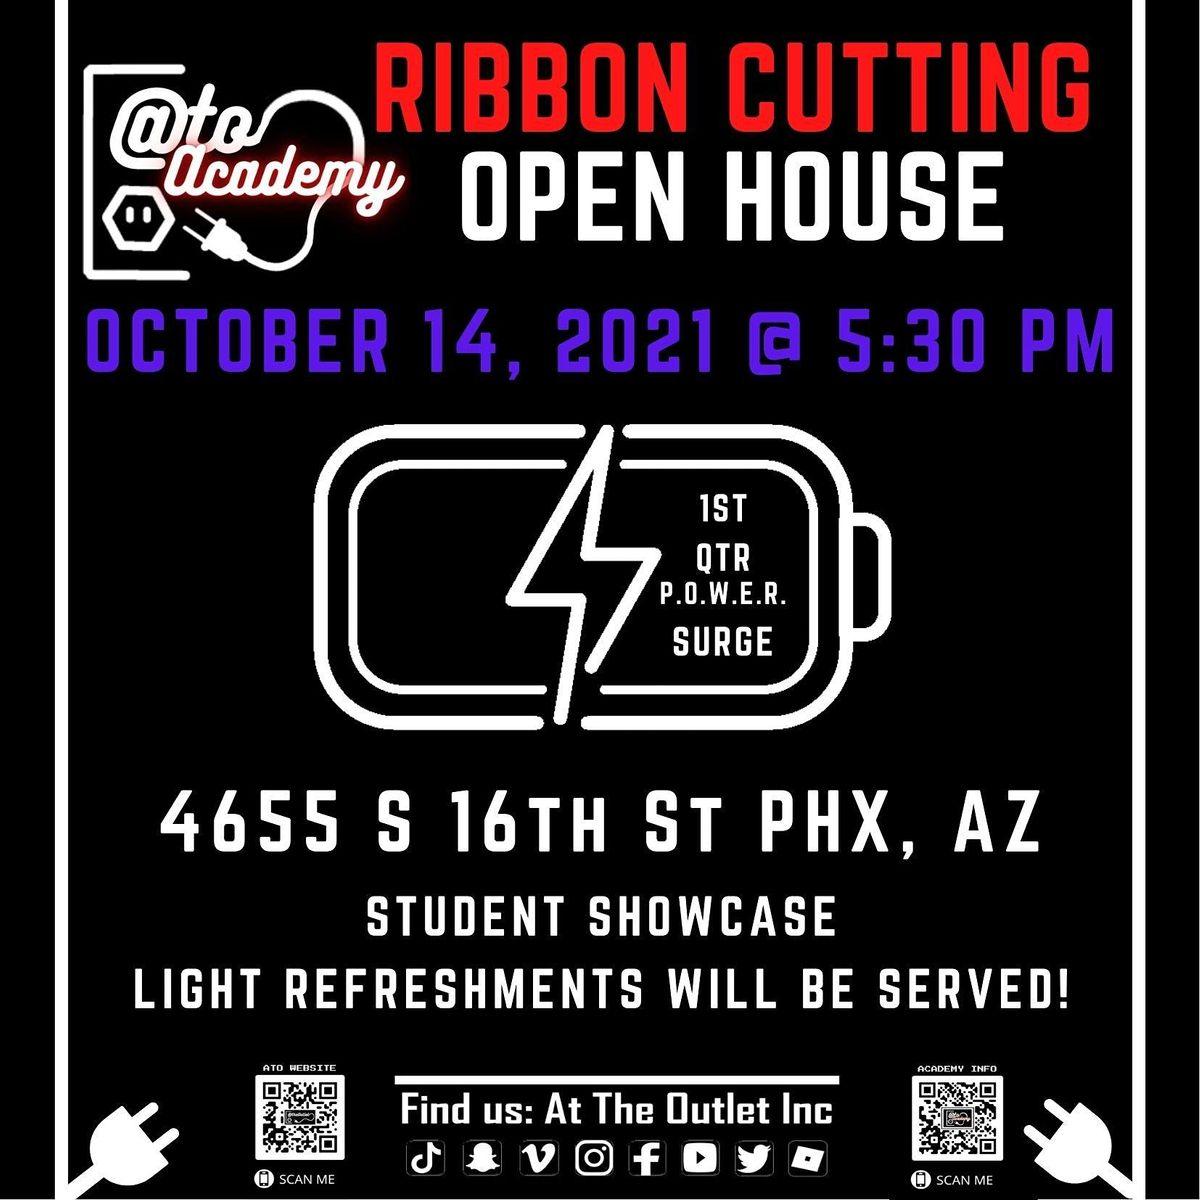 Ribbon Cutting Open House - 1st Quarter P.O.W.E.R. Surge